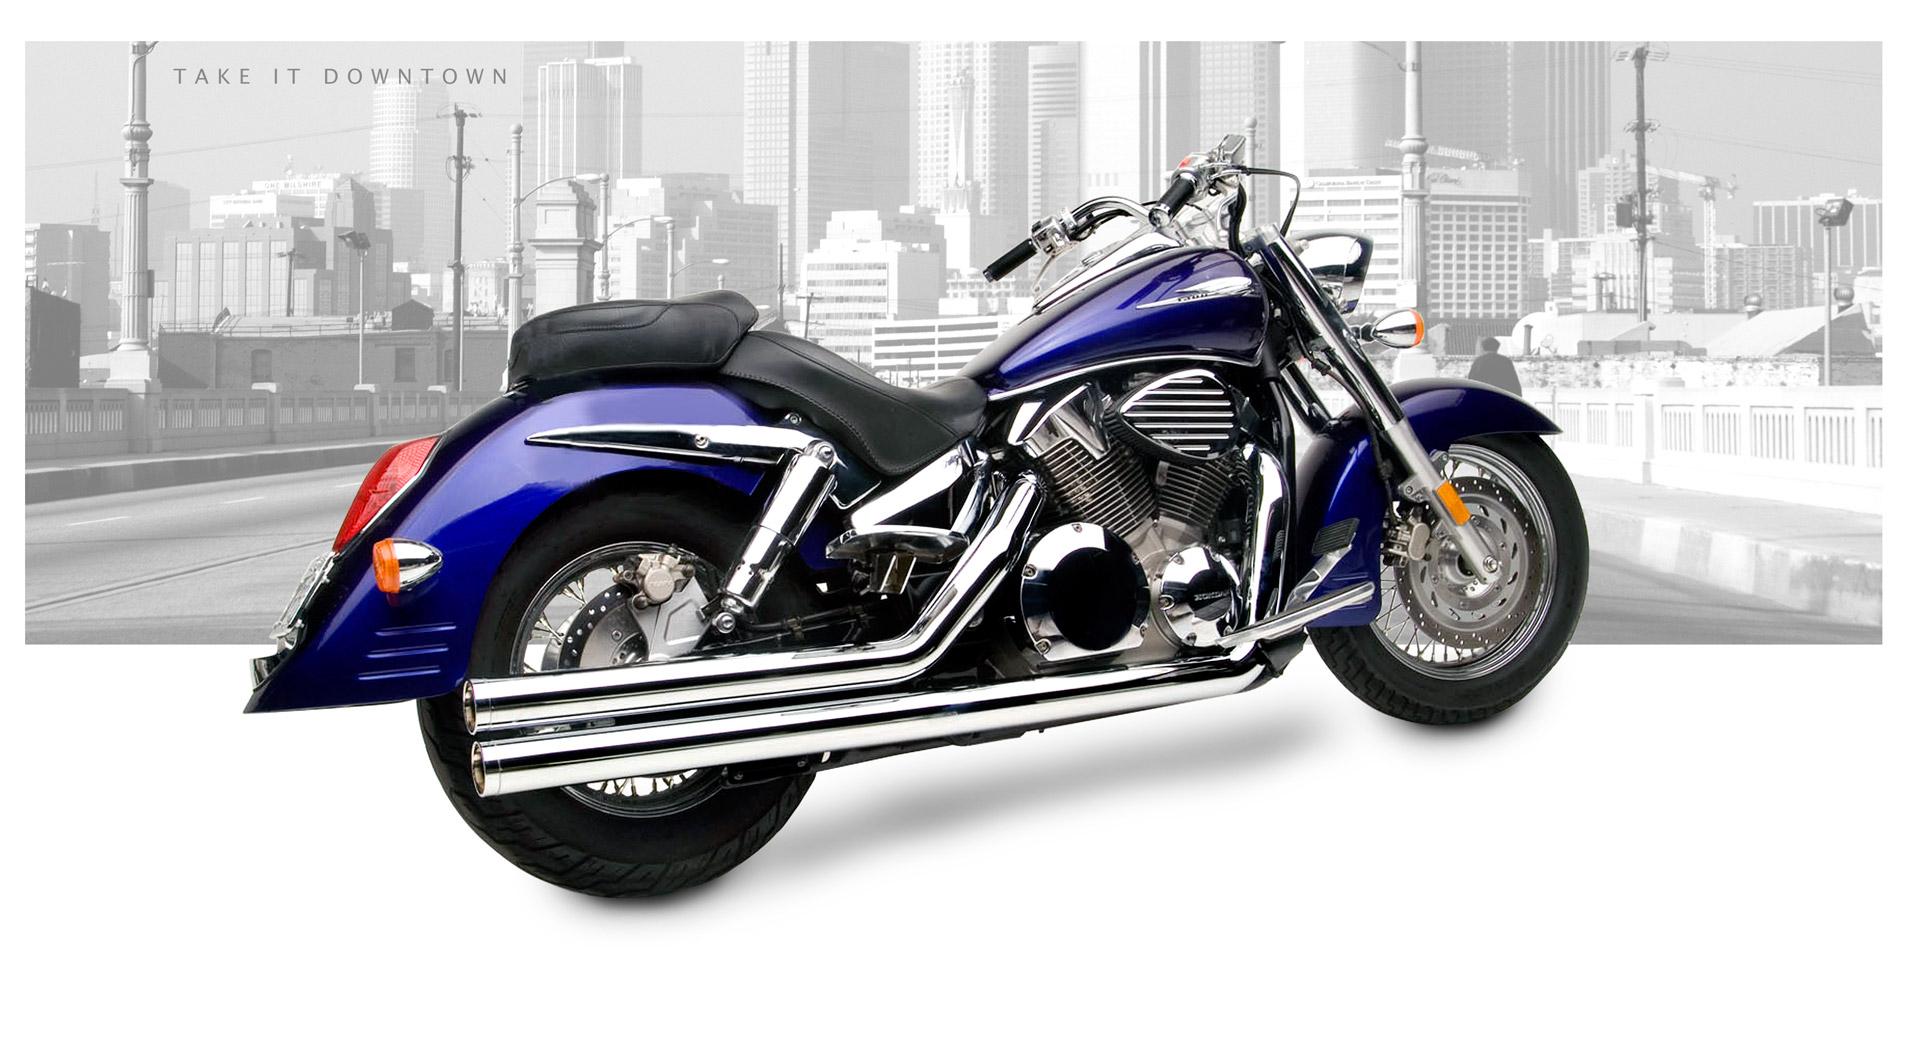 Honda VTX1300C 200409 Motorcycle Exhaust  HardKrome